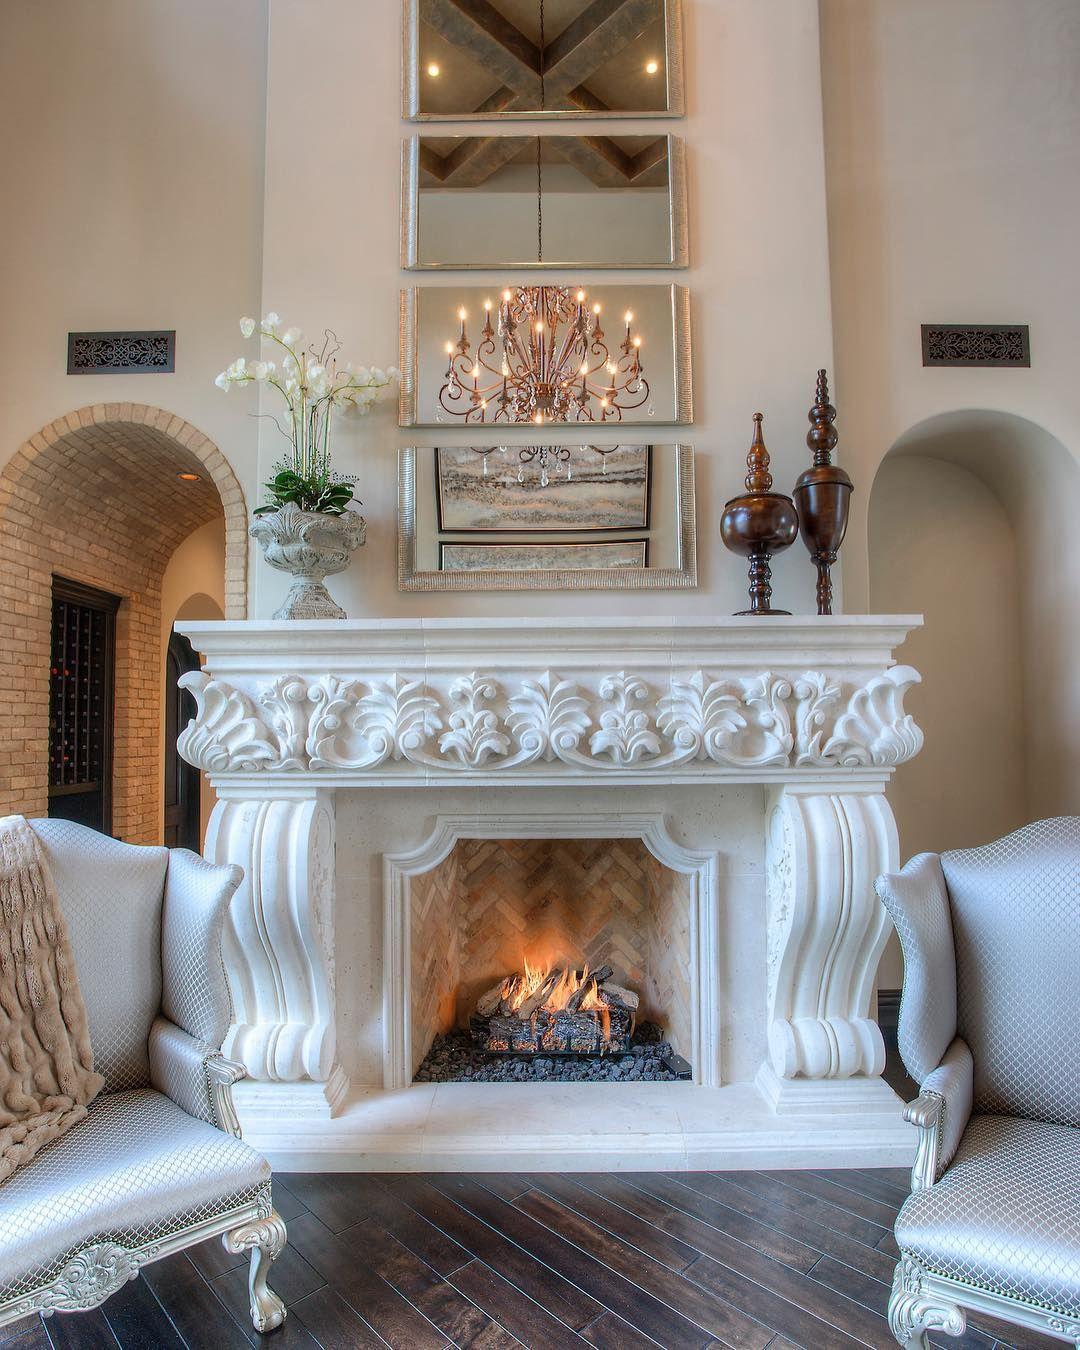 Corinthian Vent Cover Fireplace Design Home Fireplace Modern Fireplace